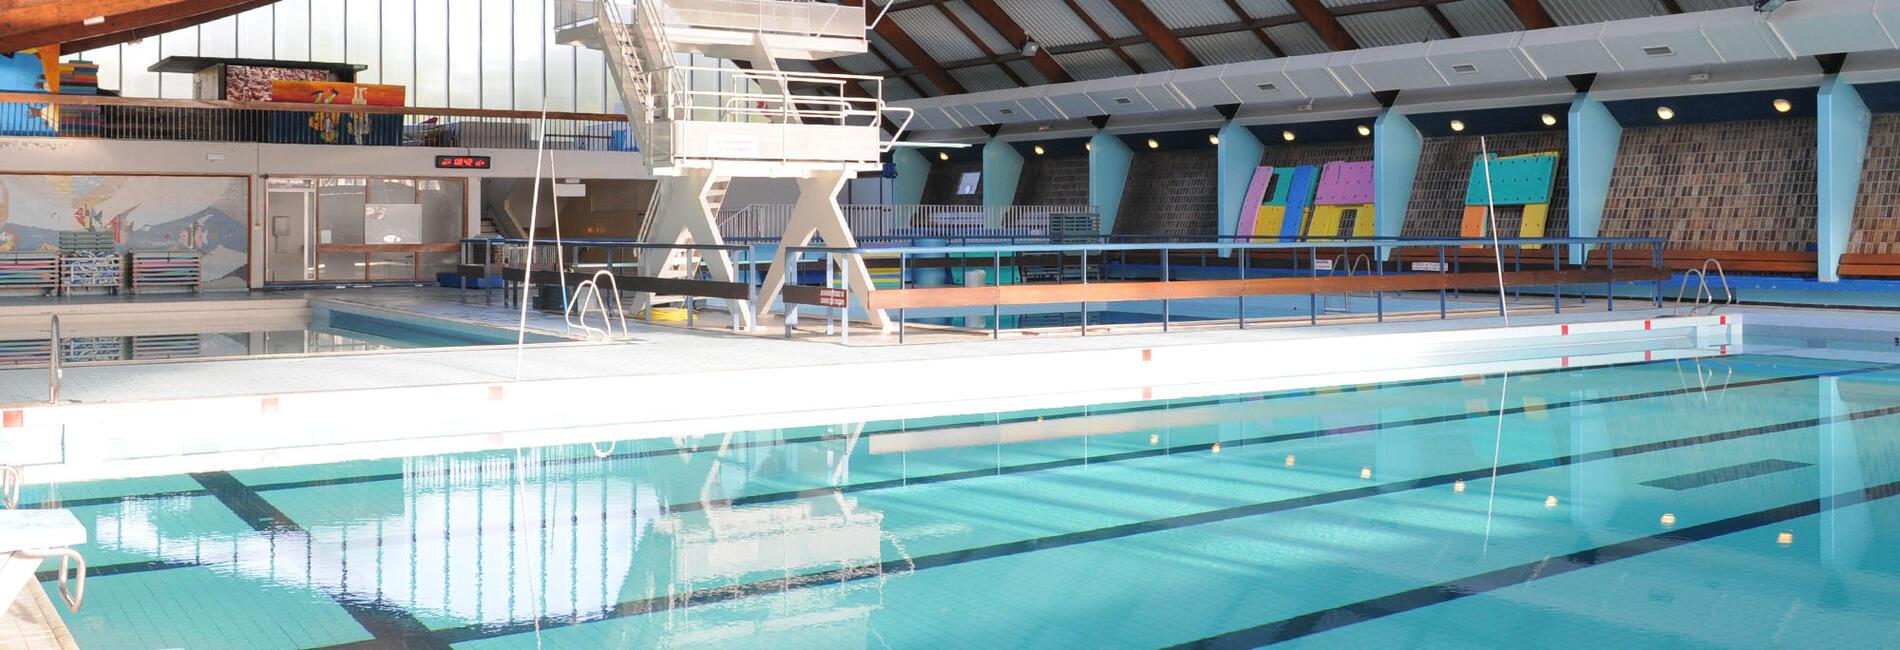 La piscine auguste delaune mairie de champigny sur marne for Claude robillard piscine horaire